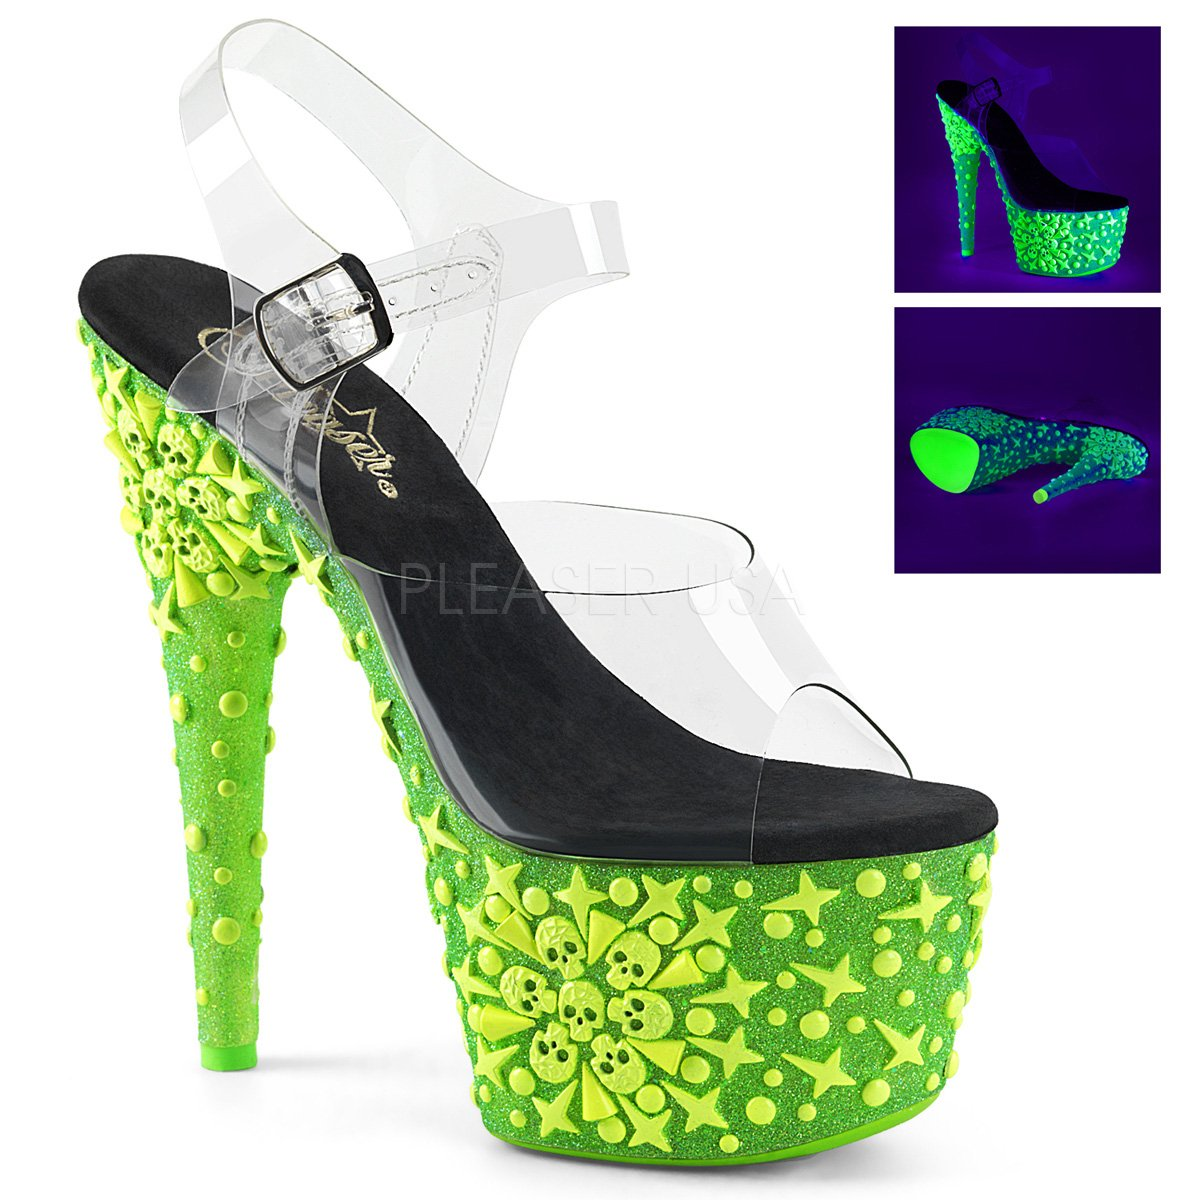 PLEASER womens ADORE-708NSK/C/GRN Sandals B074G4GLK7 9 B(M) US